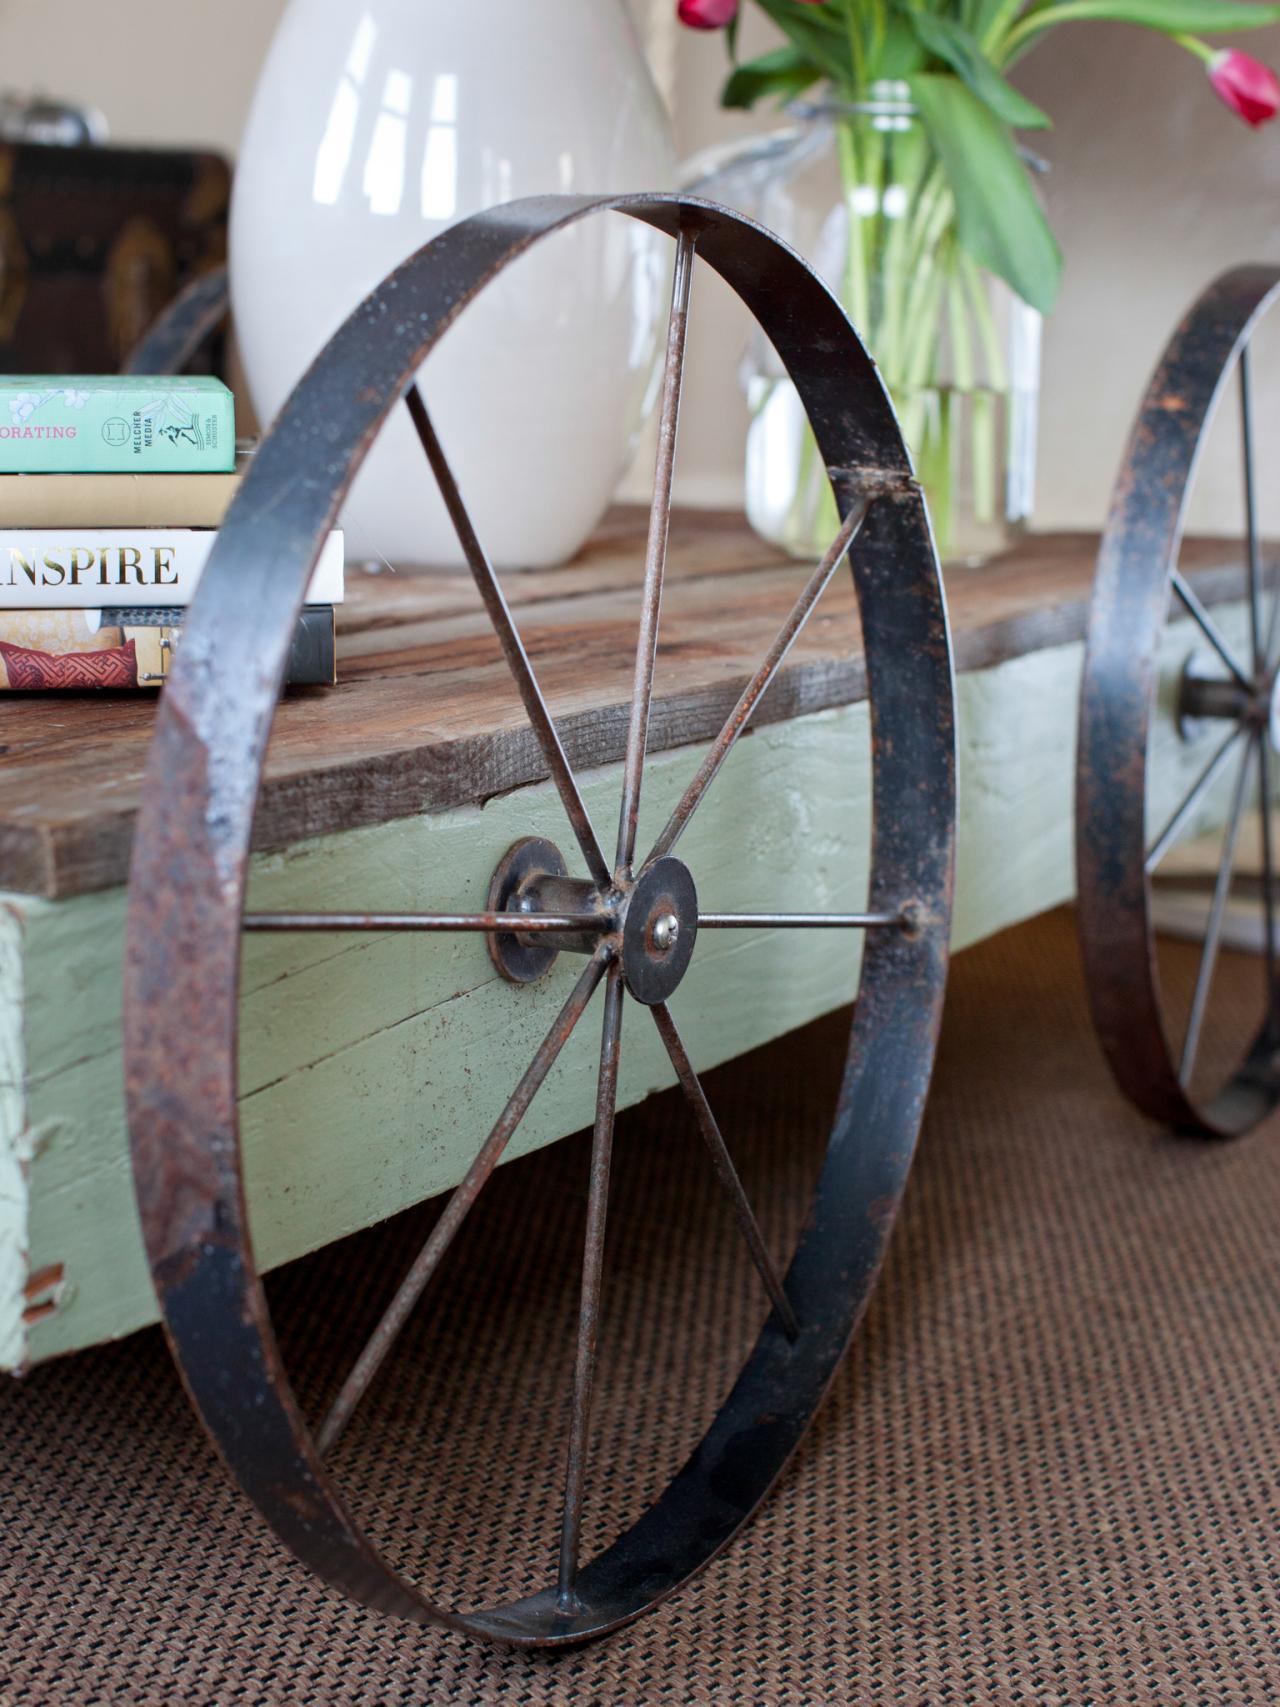 Bpf original coastal chic apartment wheel coffee table v.jpg.rend.hgtvcom.1280.1707